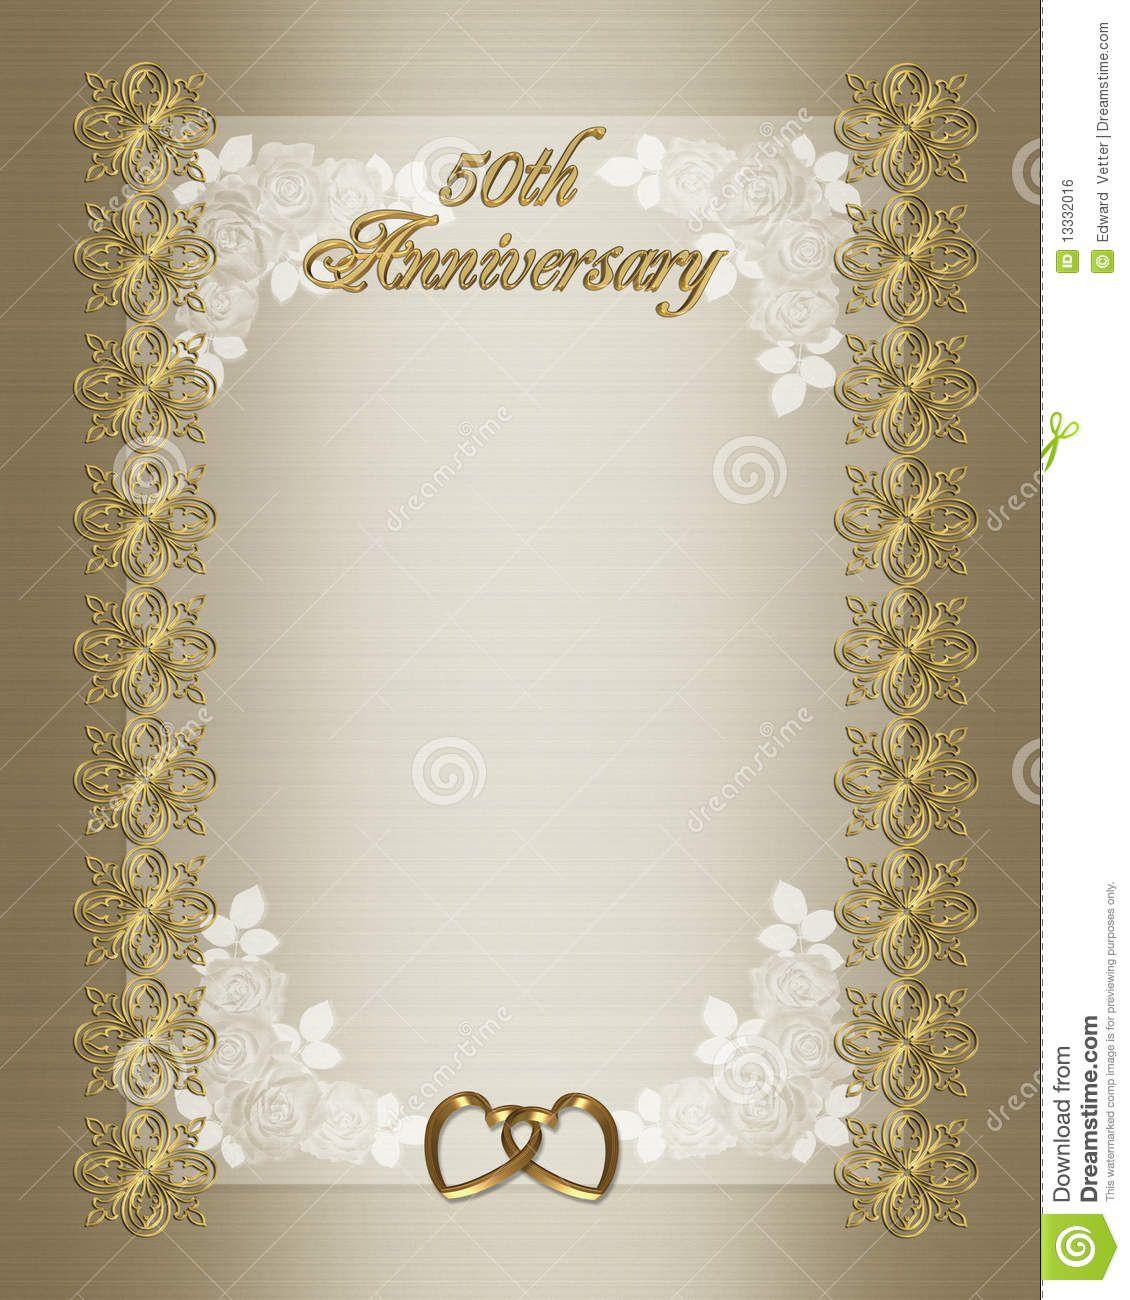 001 Awesome 50th Wedding Anniversary Invitation Template Microsoft Word High Resolution  FreeFull